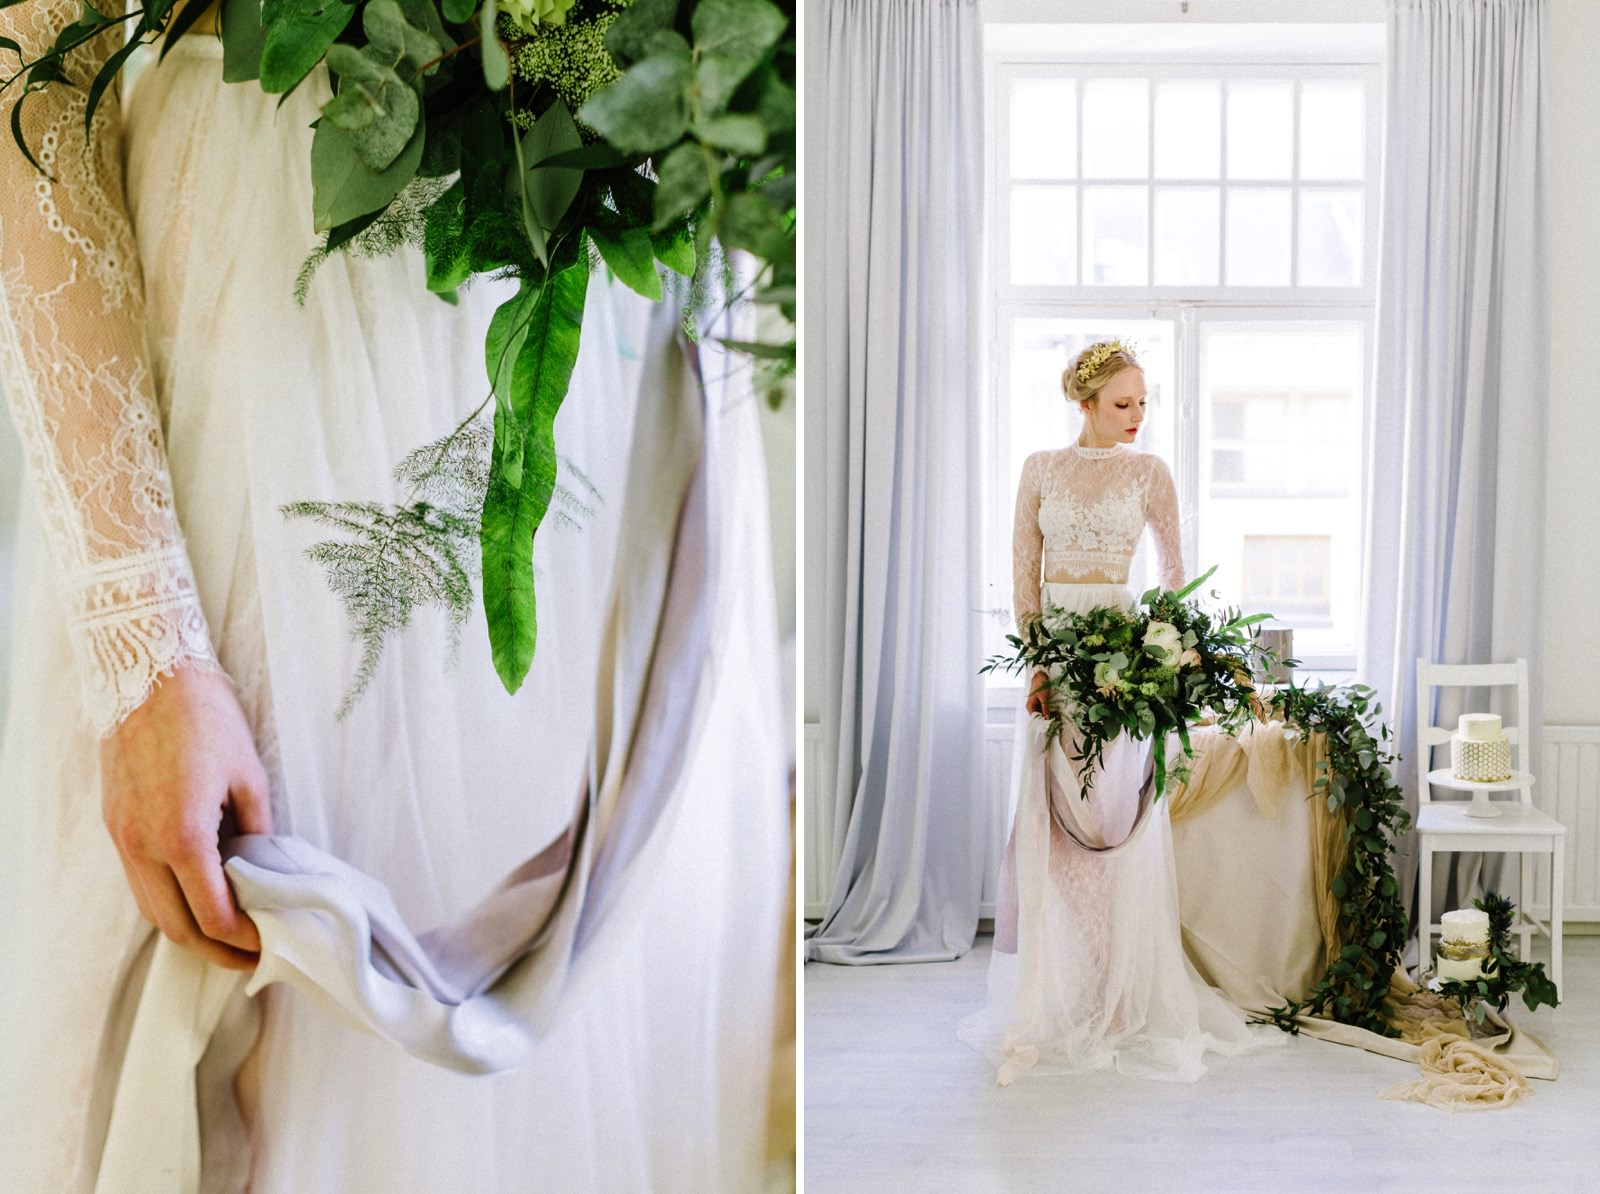 Finland fine art photographer